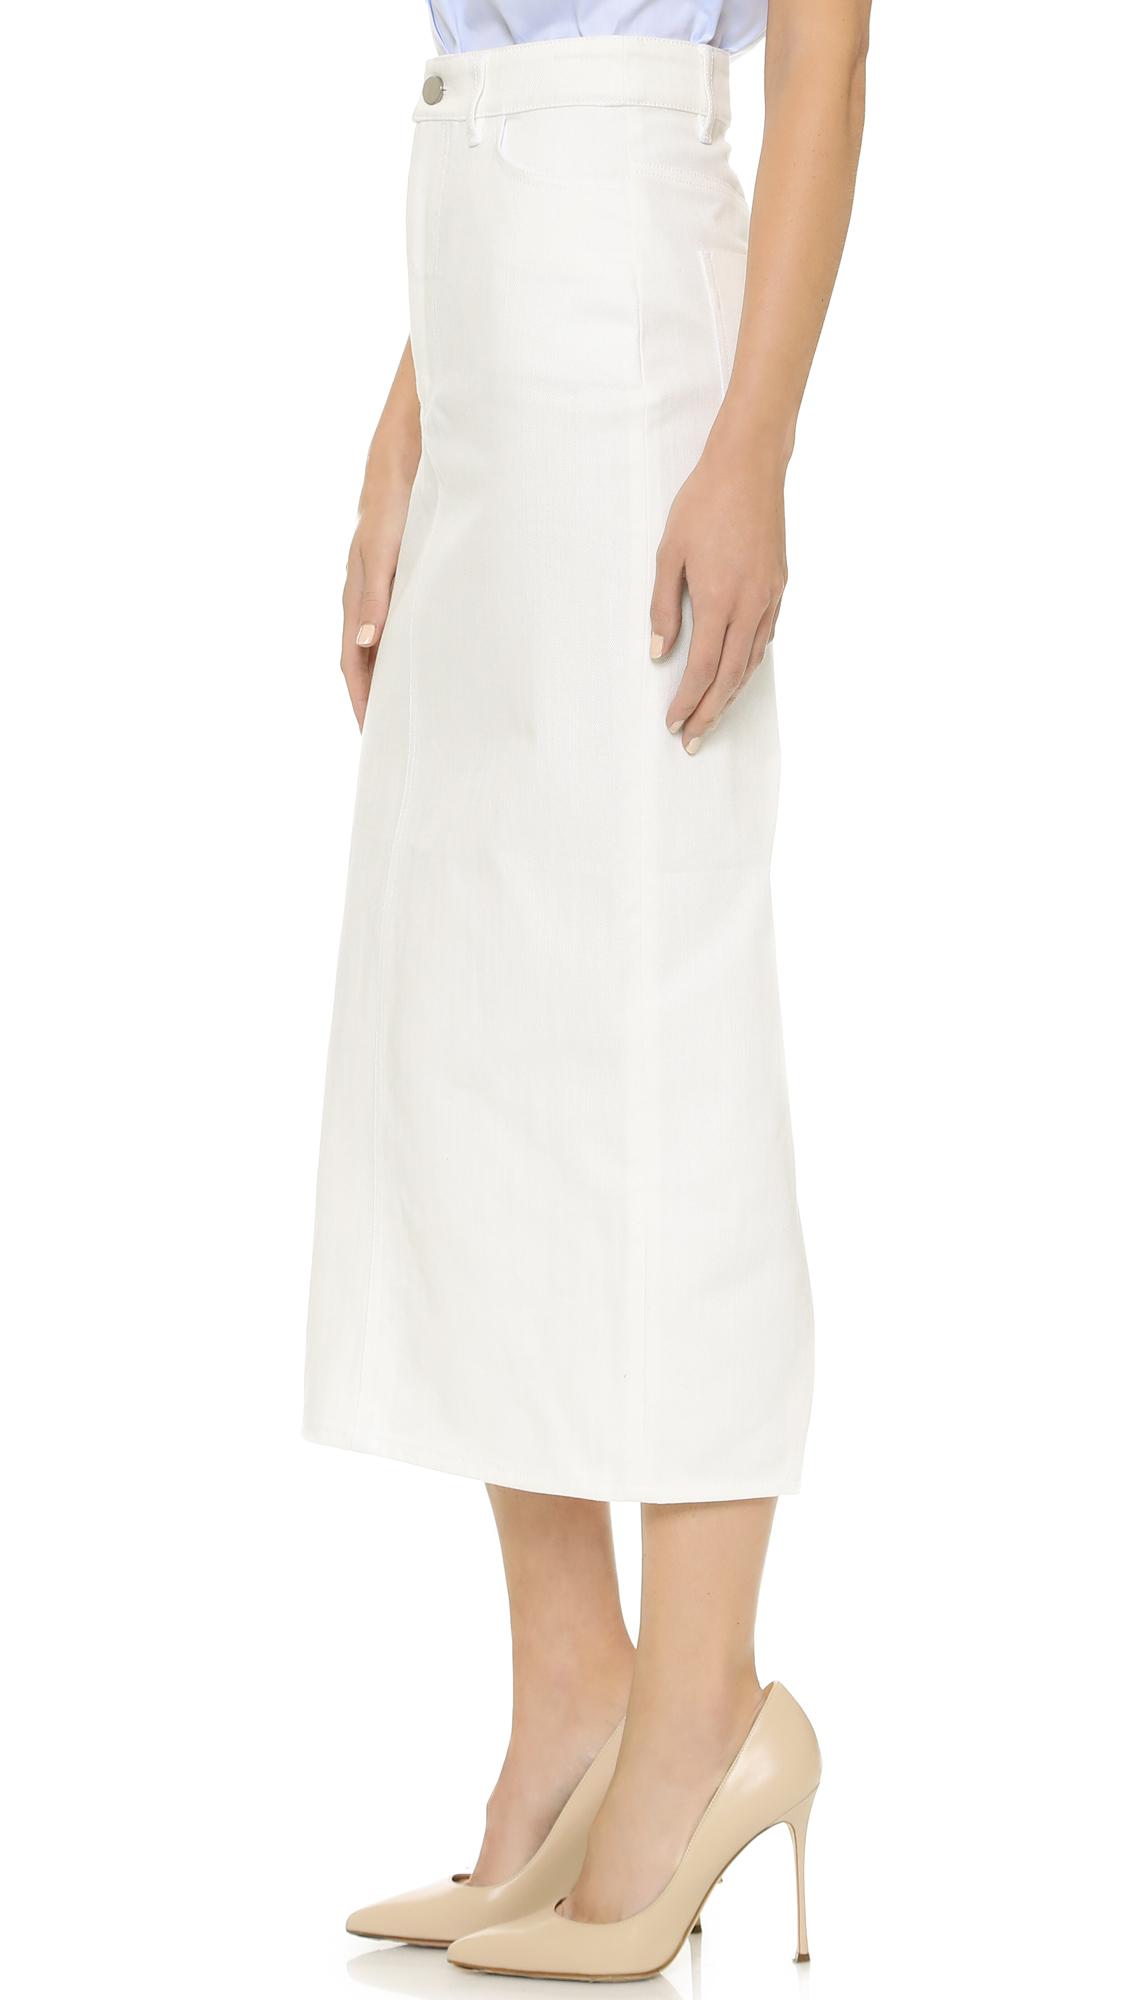 Victoria beckham Split Denim Skirt in White | Lyst